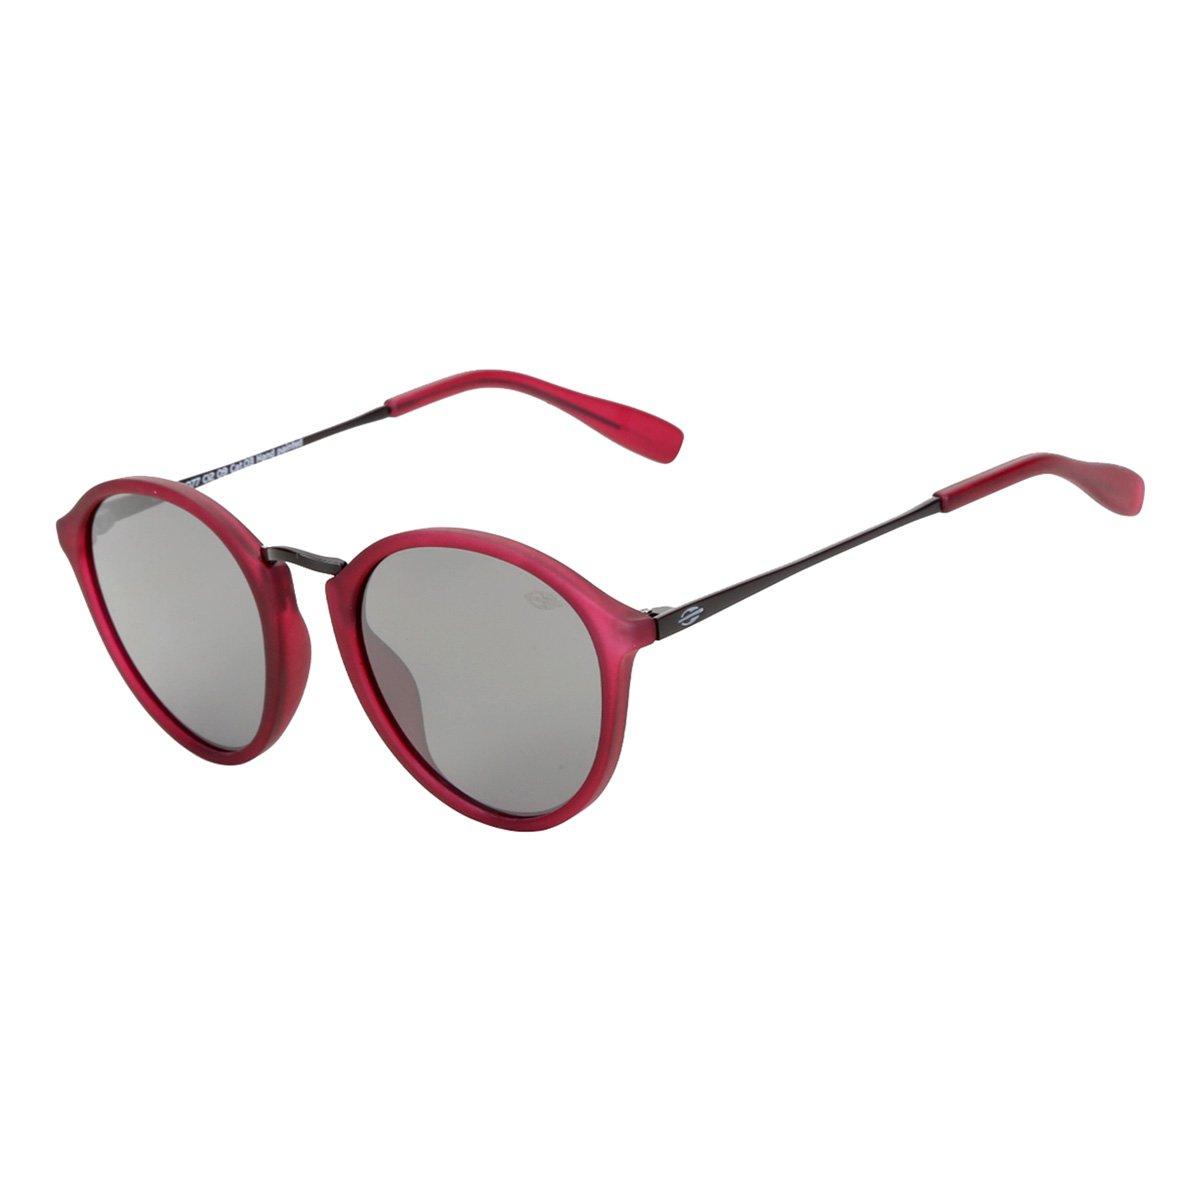 Óculos De Sol Mormaii Cali Burgundy Fosco Lente Cinza